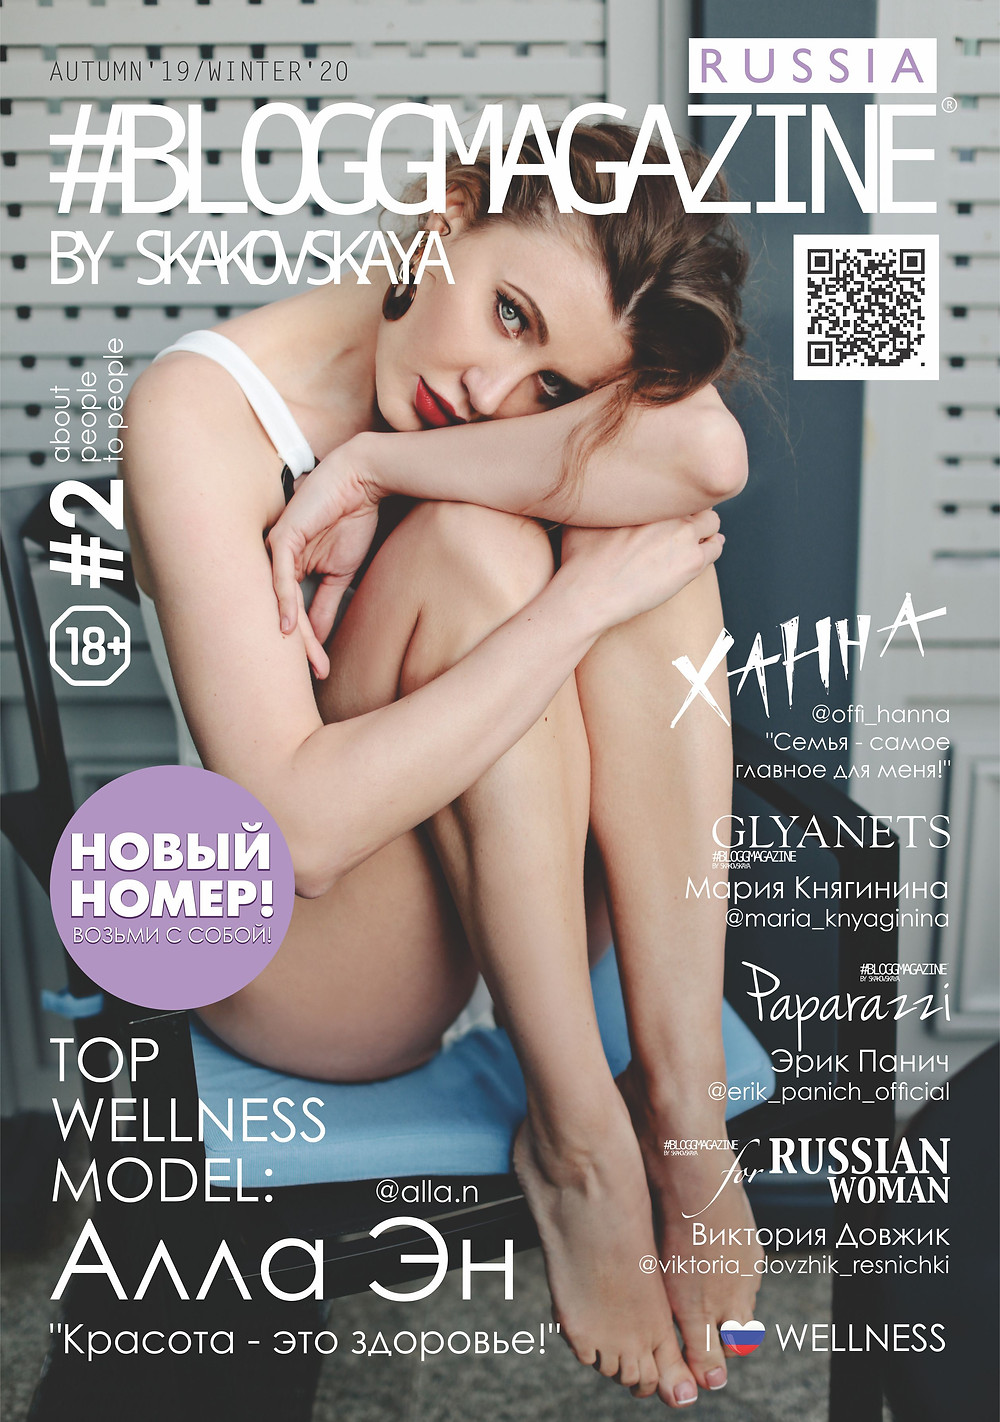 алла эн, bloggmagazine russia, cover magazine, обложка журнала, alla n, русский глянец